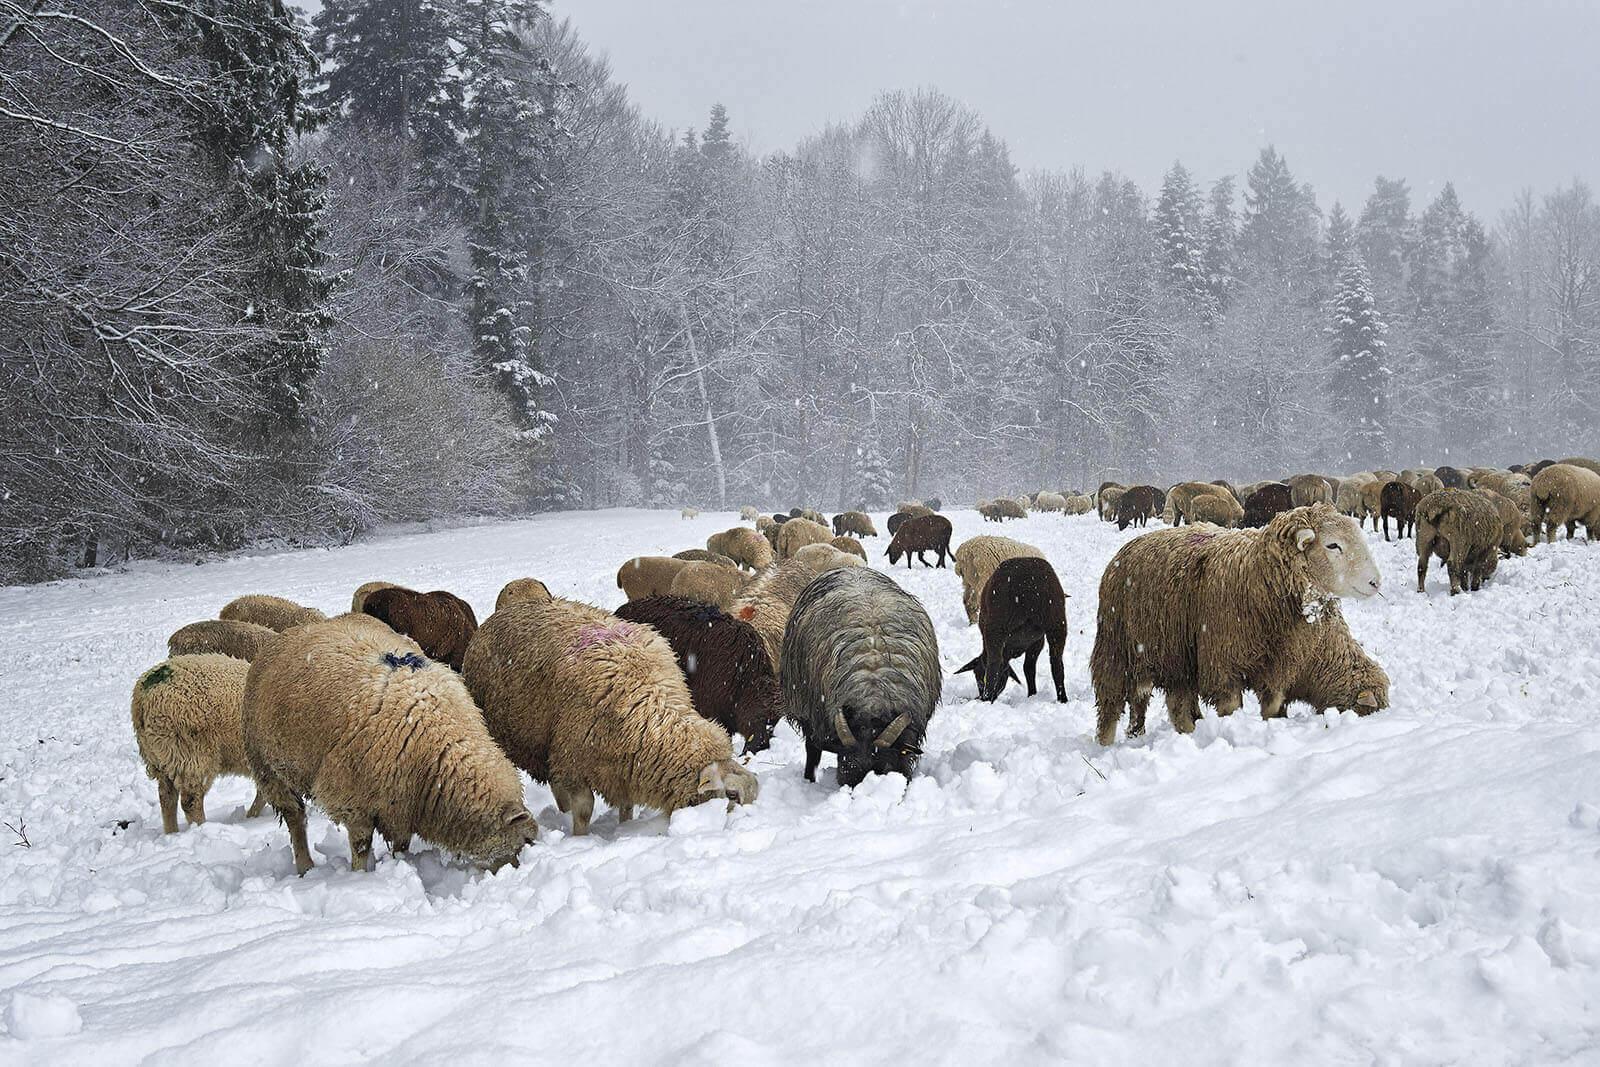 Landwirt_Rudy_Canonica_3269.jpg